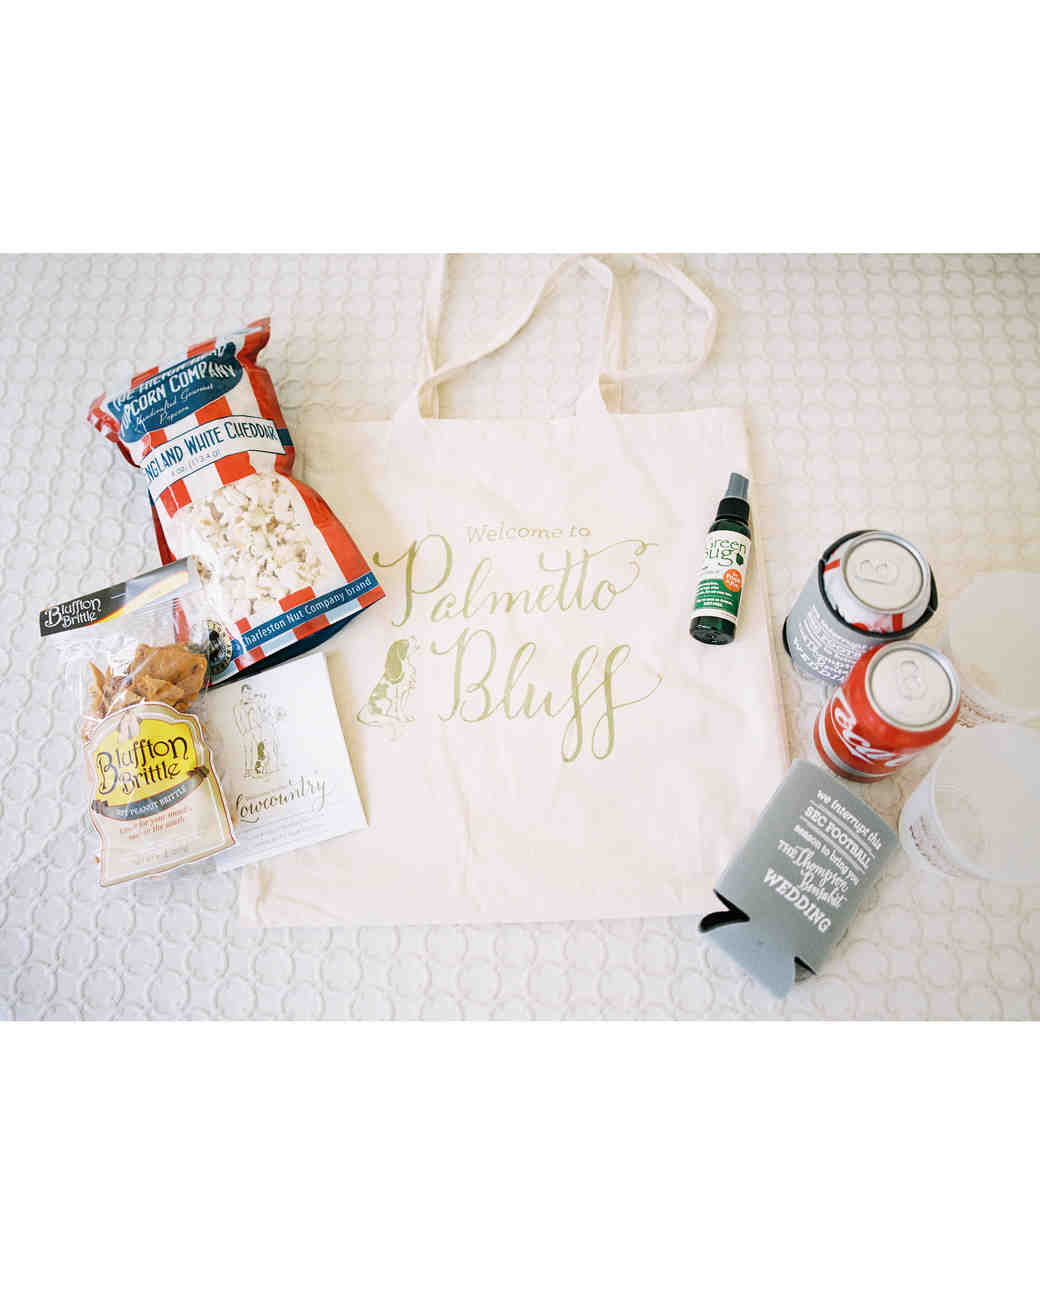 taylor-john-wedding-welcome-bag-11-s113035-0616.jpg